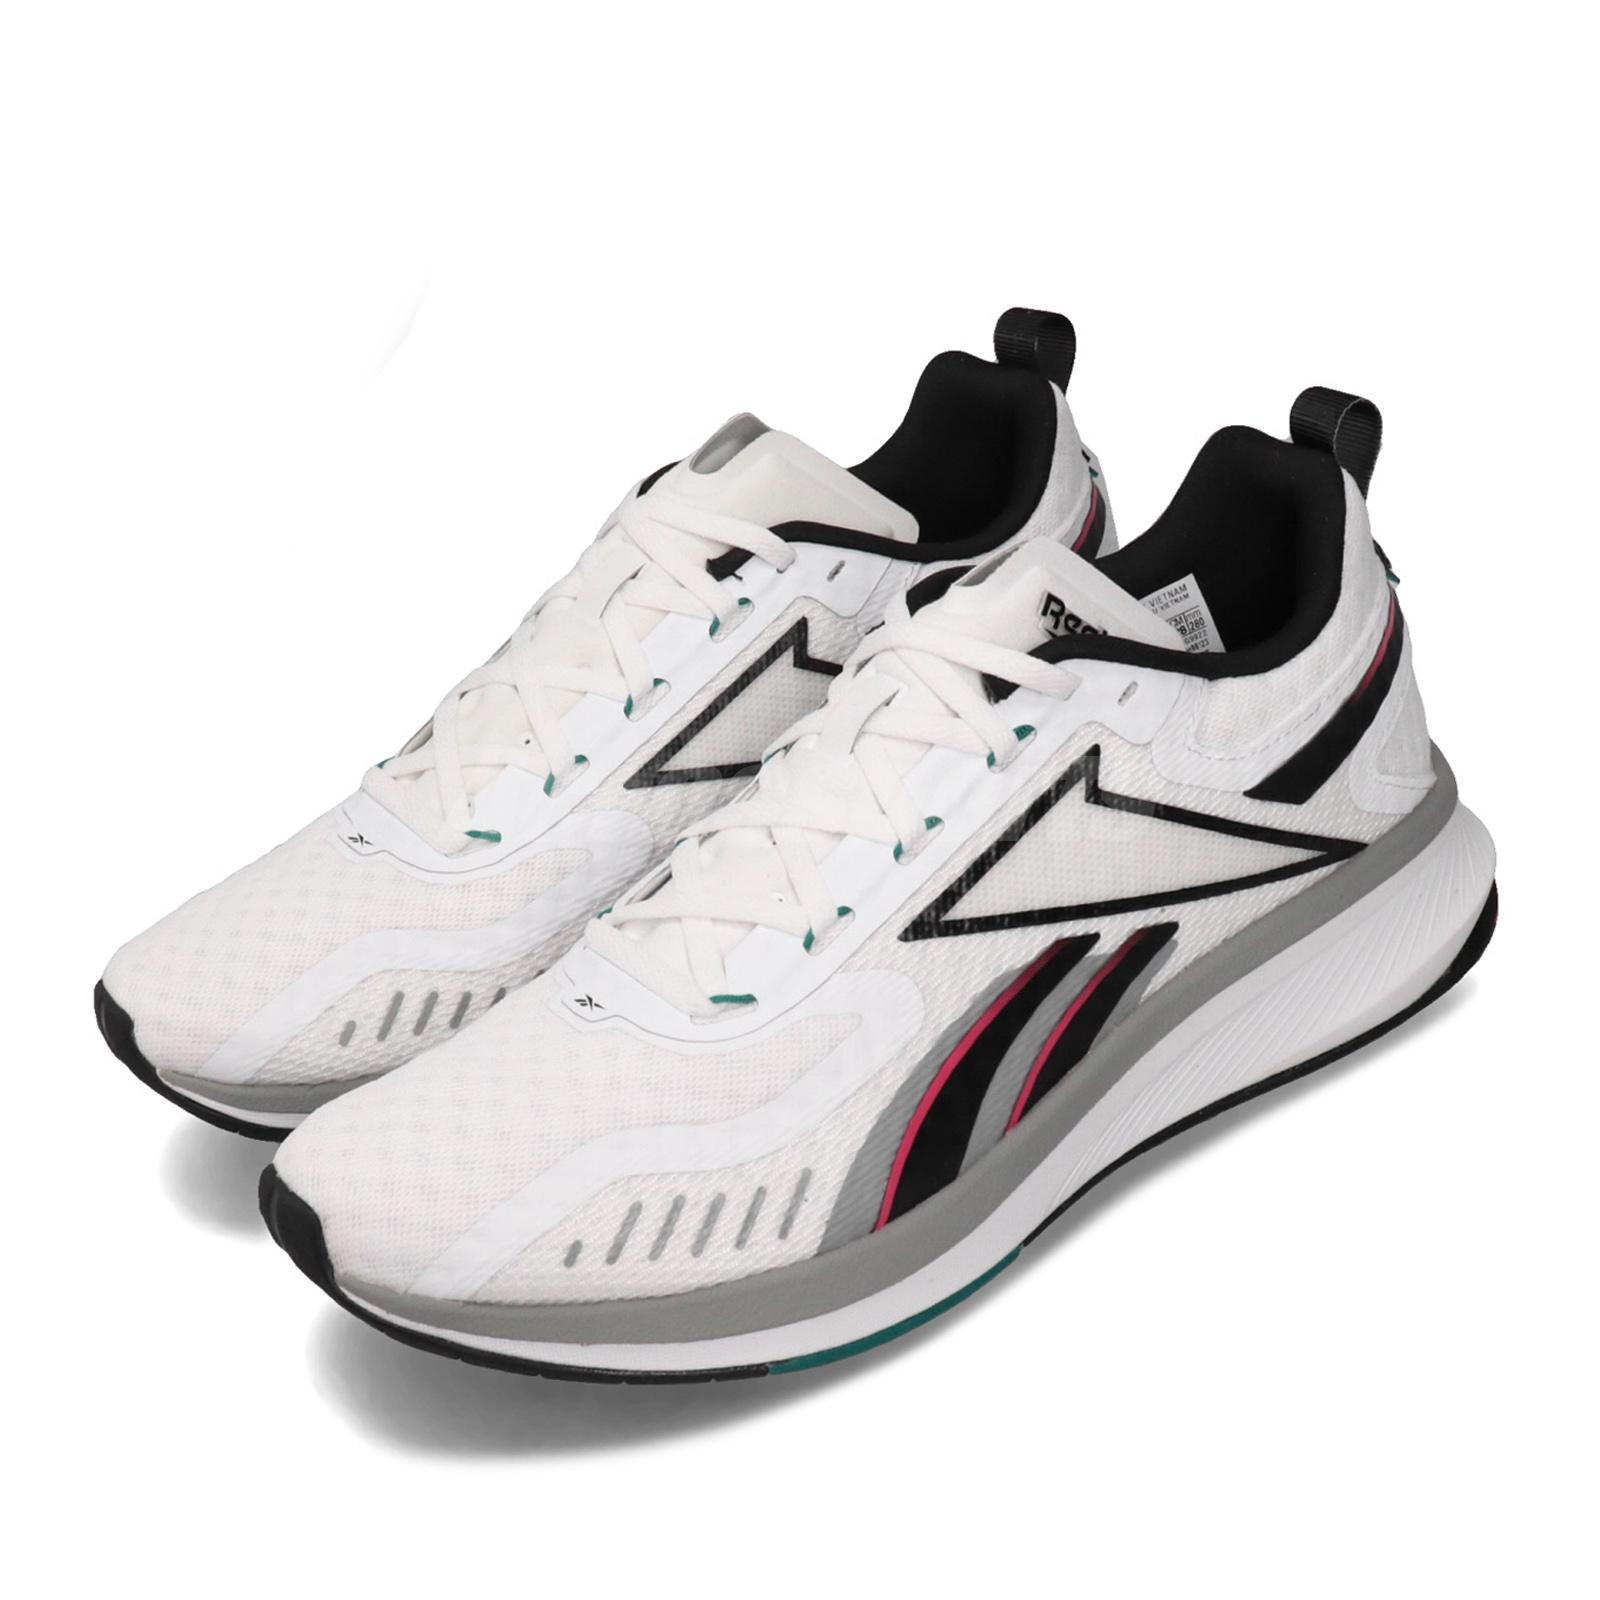 perdonar Ciro Erudito  Reebok RBK-Fusium Run 20 White Black Pink Grey Men Running Shoes ...